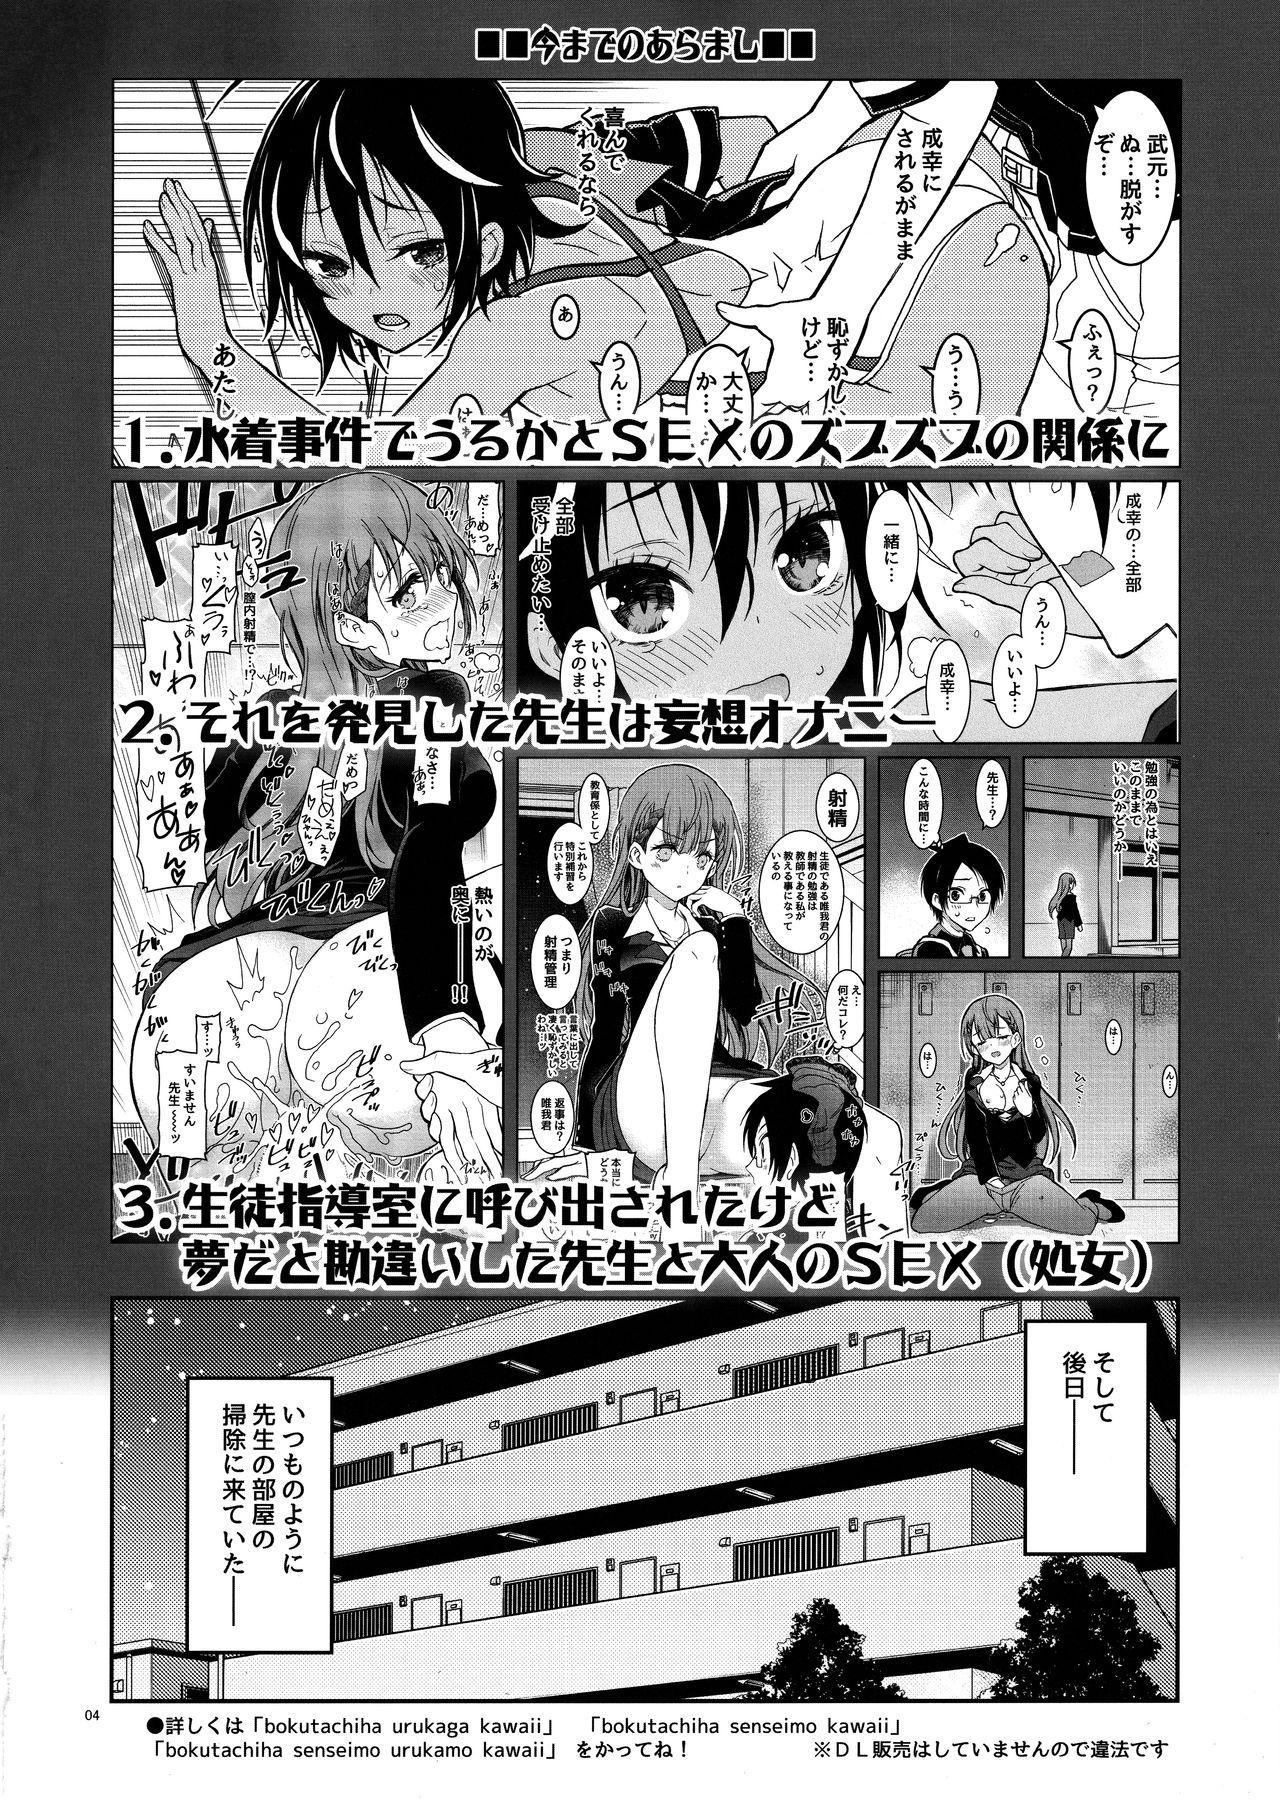 BOKUTACHIHA SENSEIMO URUKAMO KAWAII 2 | Our Sensei And Uruka Are Both So Cute 2 2